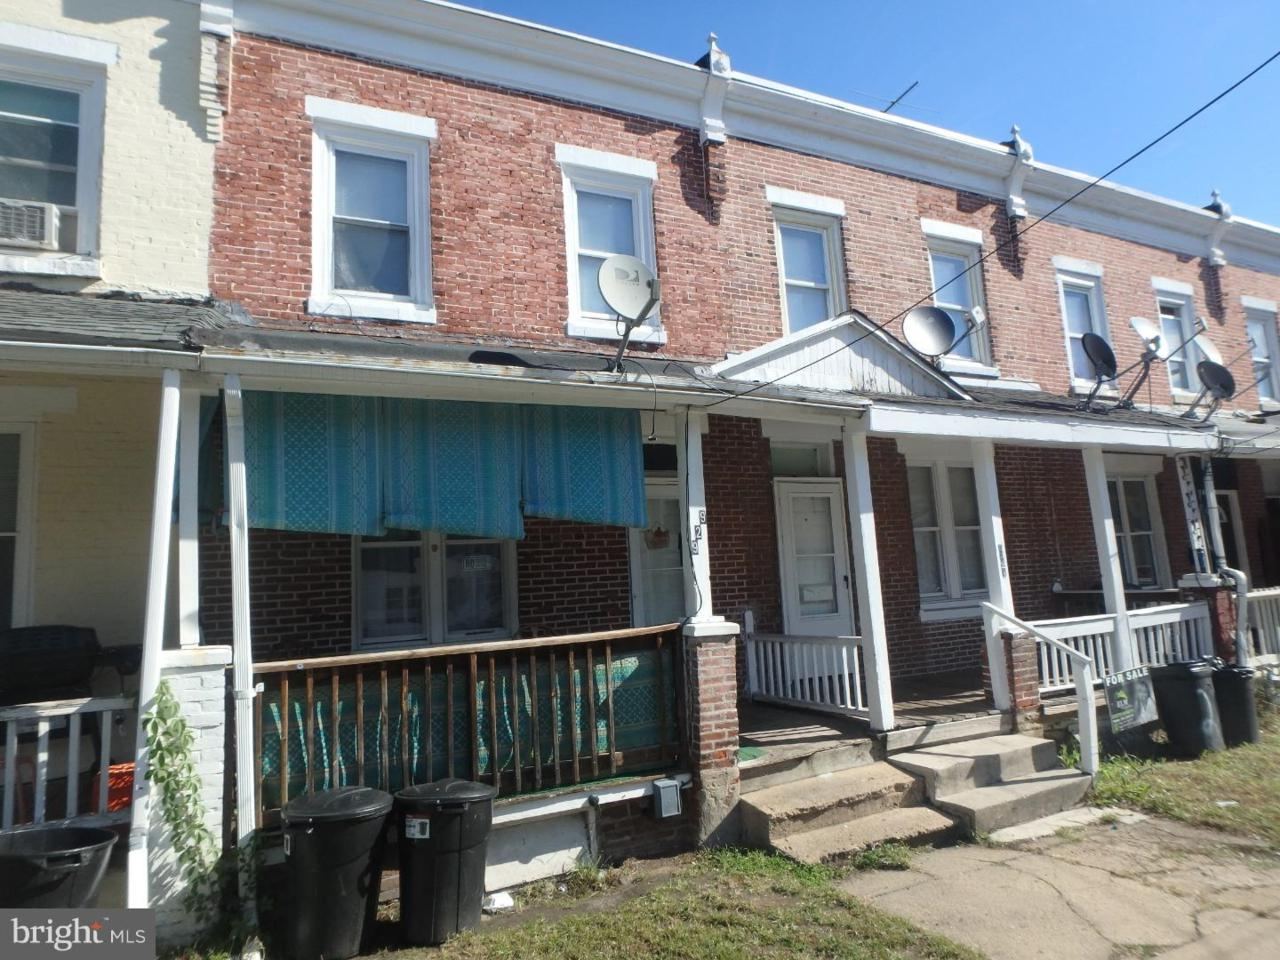 929 17TH Street - Photo 1